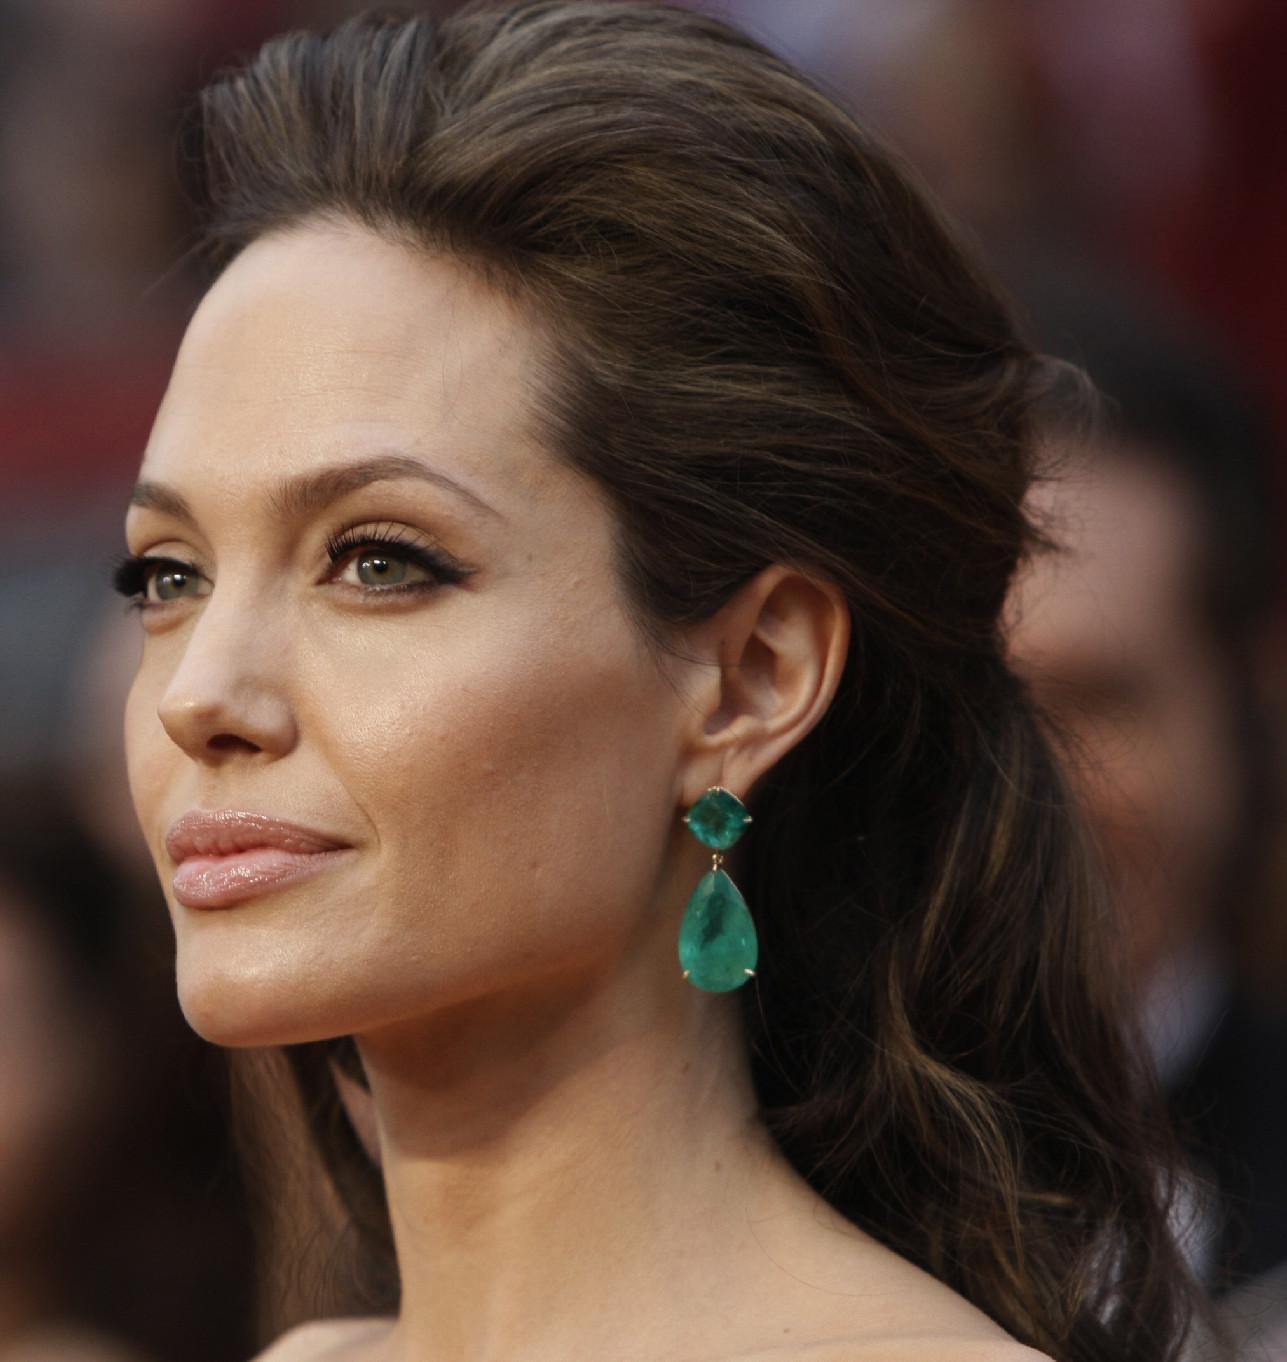 http://4.bp.blogspot.com/_EcYgAOhPYlo/TTuhqMMumFI/AAAAAAAAJkc/-LBvlyR8Aig/s1600/Angelina_Jolie_Emerald_Earrings.jpg